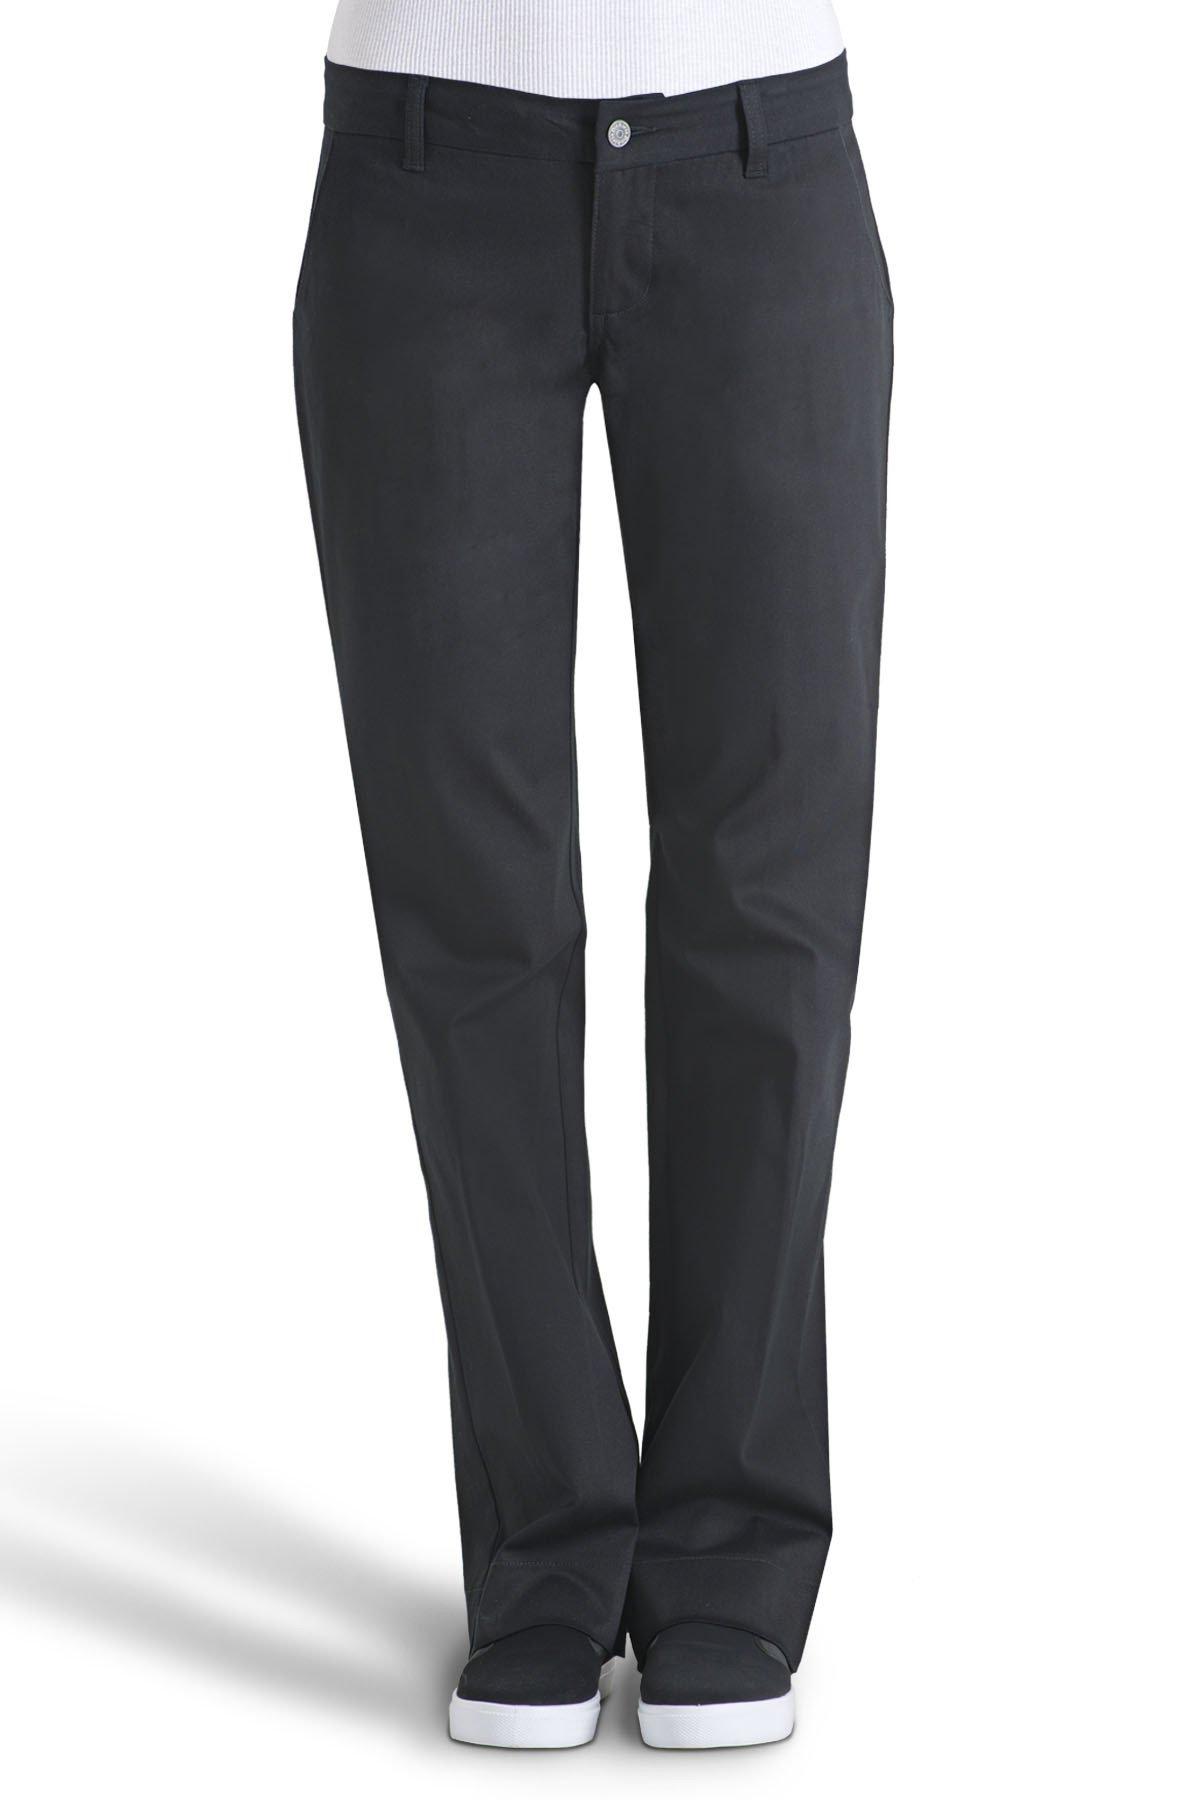 Dickies Girls Juniors' Bull 4-Pocket Bootcut Pant-School Uniform,Black,0